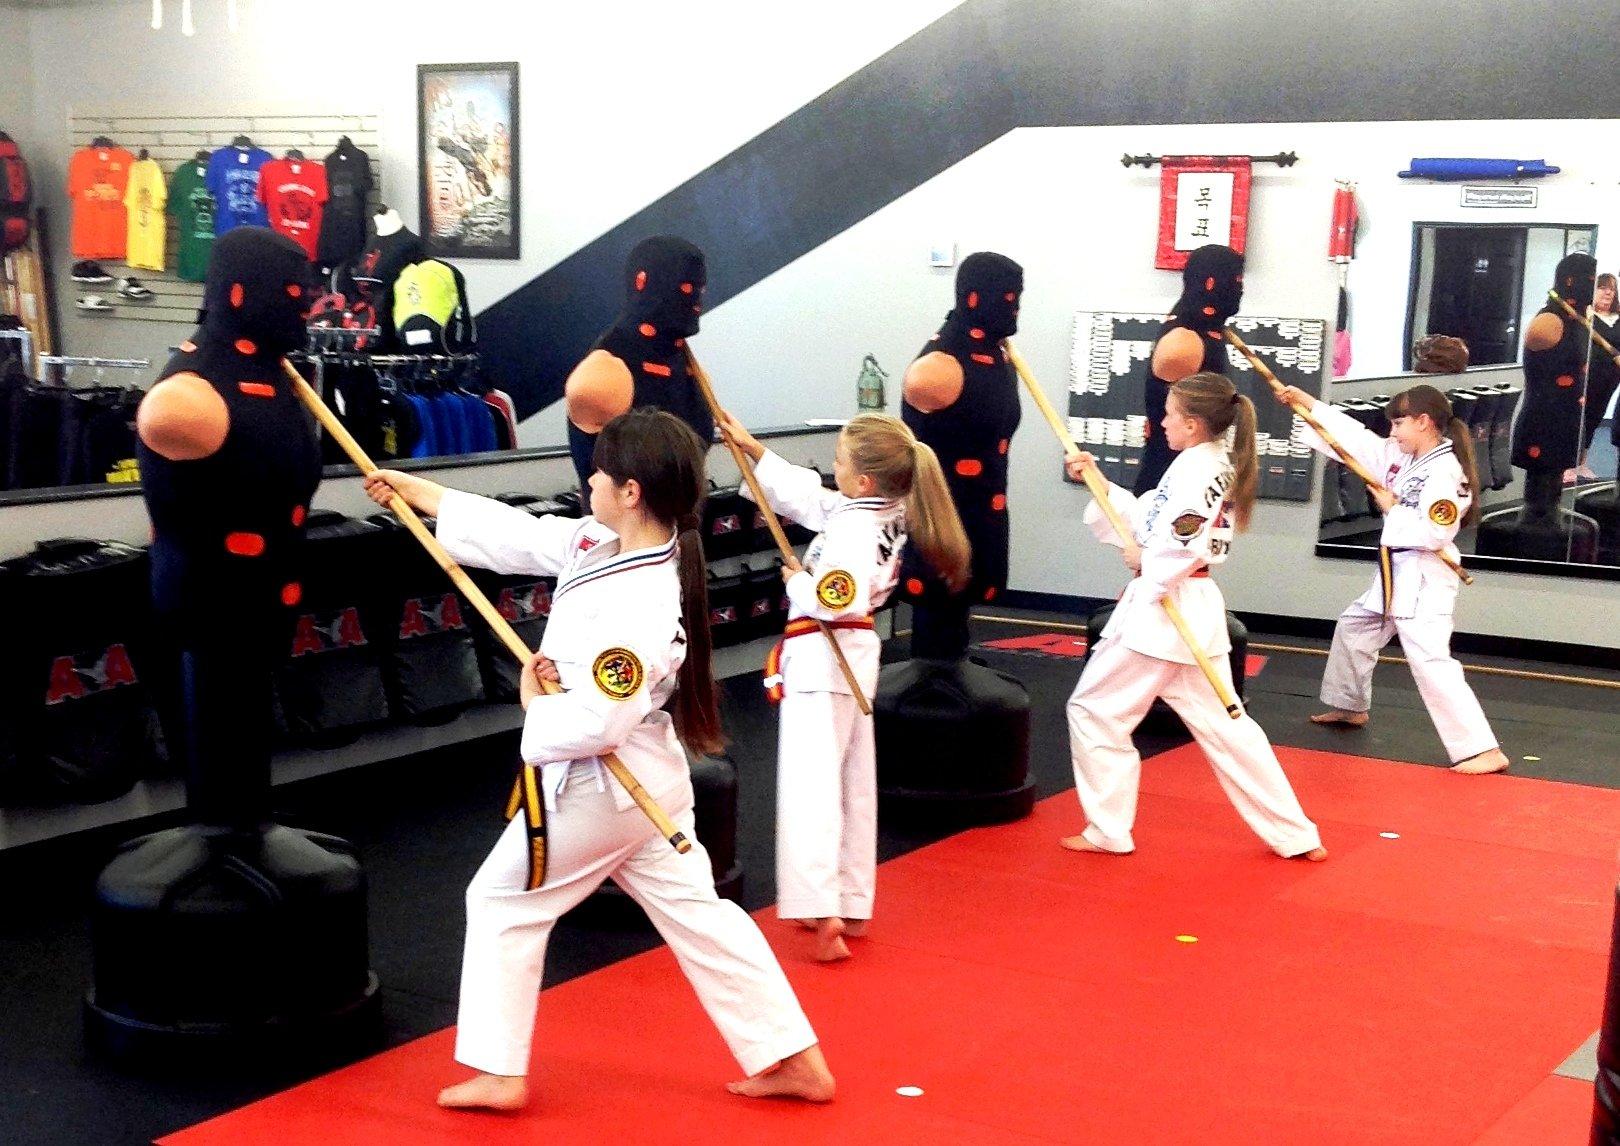 Strike-Skin Self Defense Training Aide ***BOB Punching Bag NOT Included by Strike-Skin (Image #7)